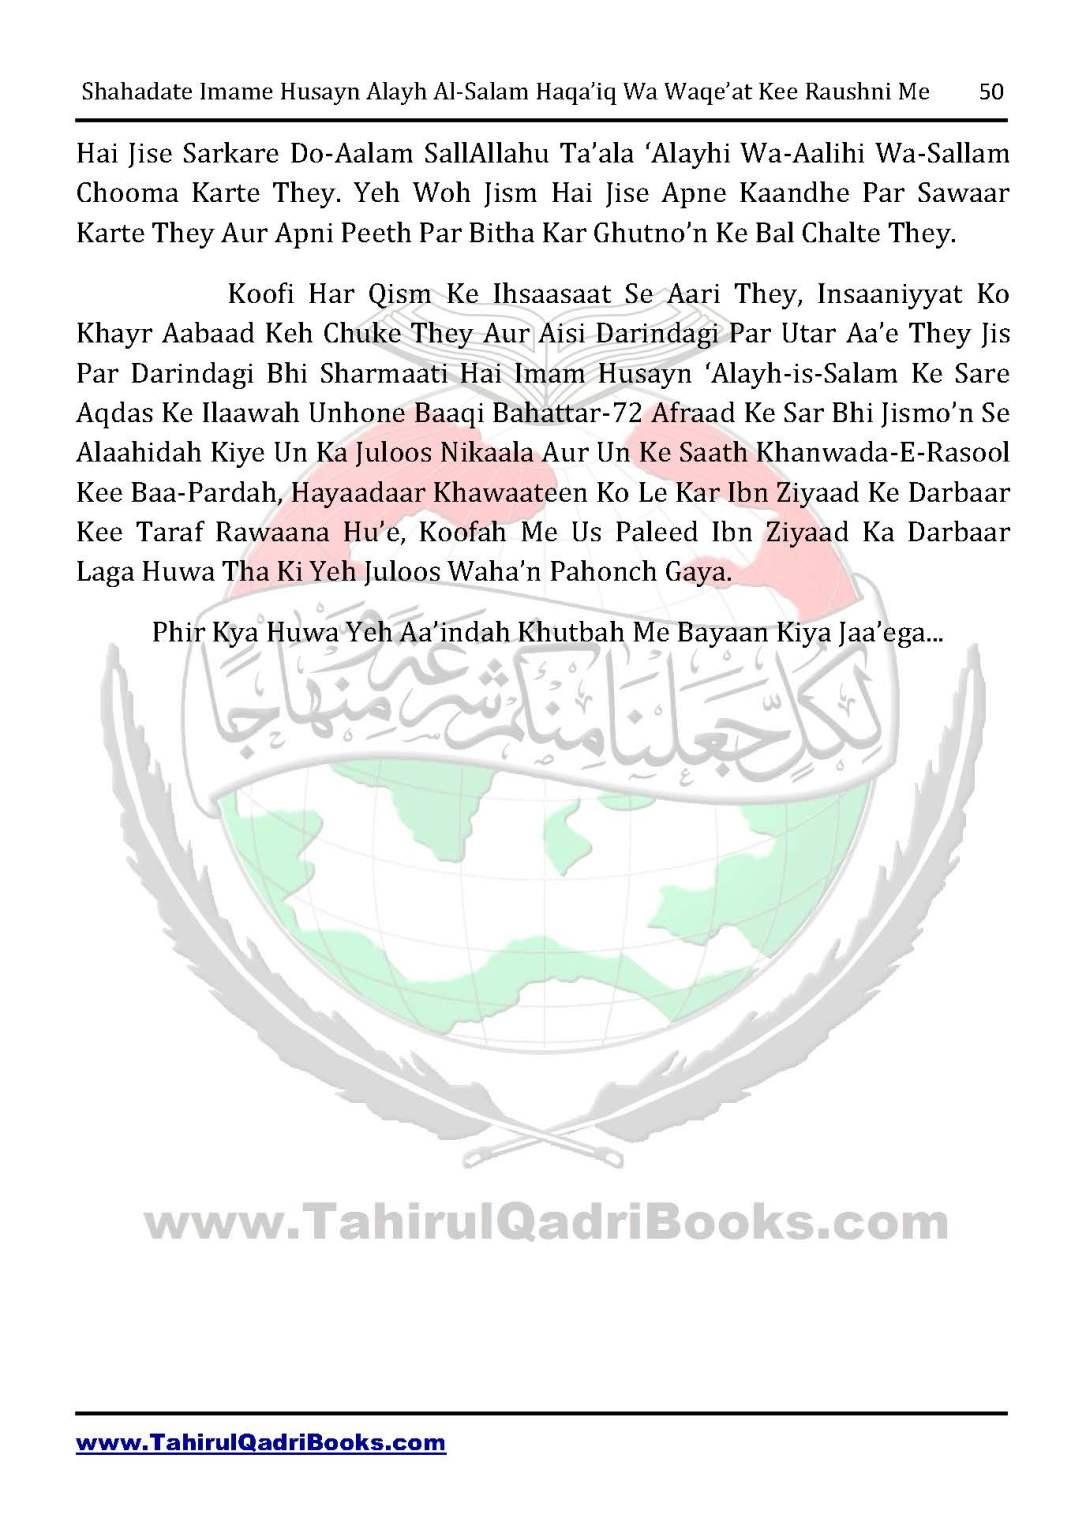 shahadate-imame-husayn-alayh-is-salam-haqaiq-wa-waqe_at-kee-raushni-me-in-roman-urdu-unlocked_Page_50